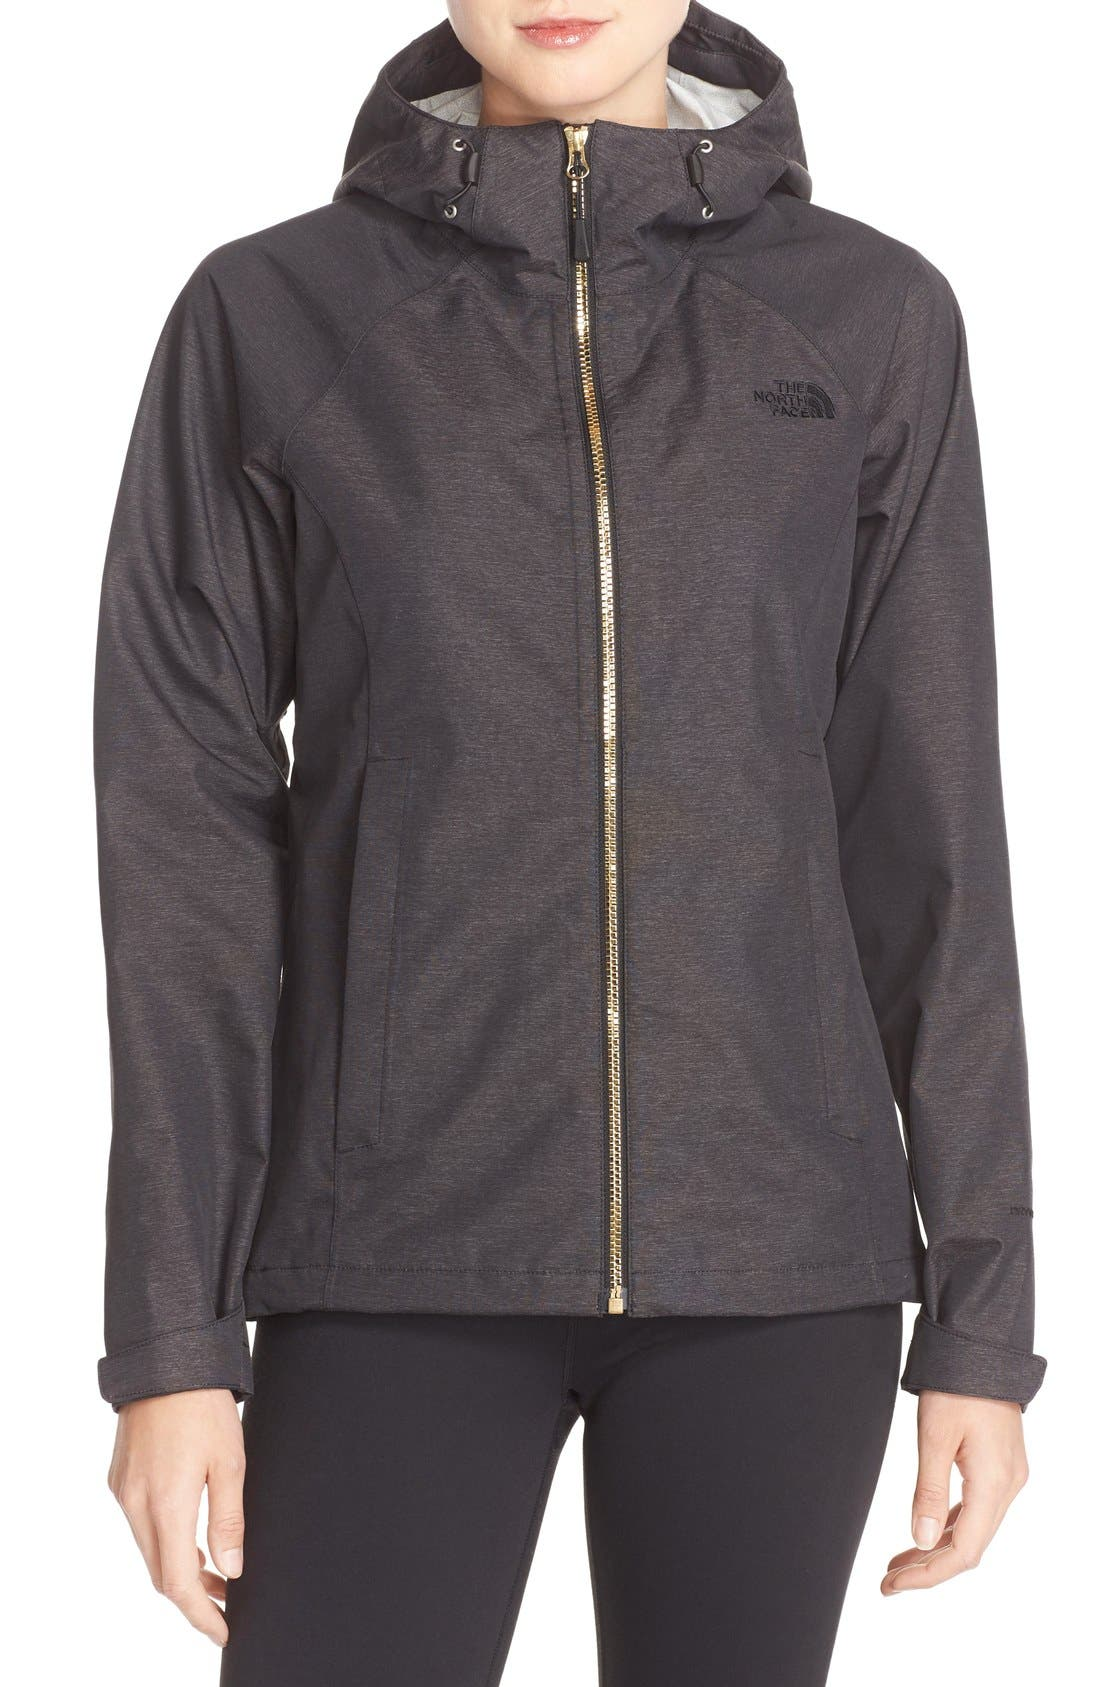 THE NORTH FACE 'Magnolia' Waterproof Rain Jacket, Main, color, 001